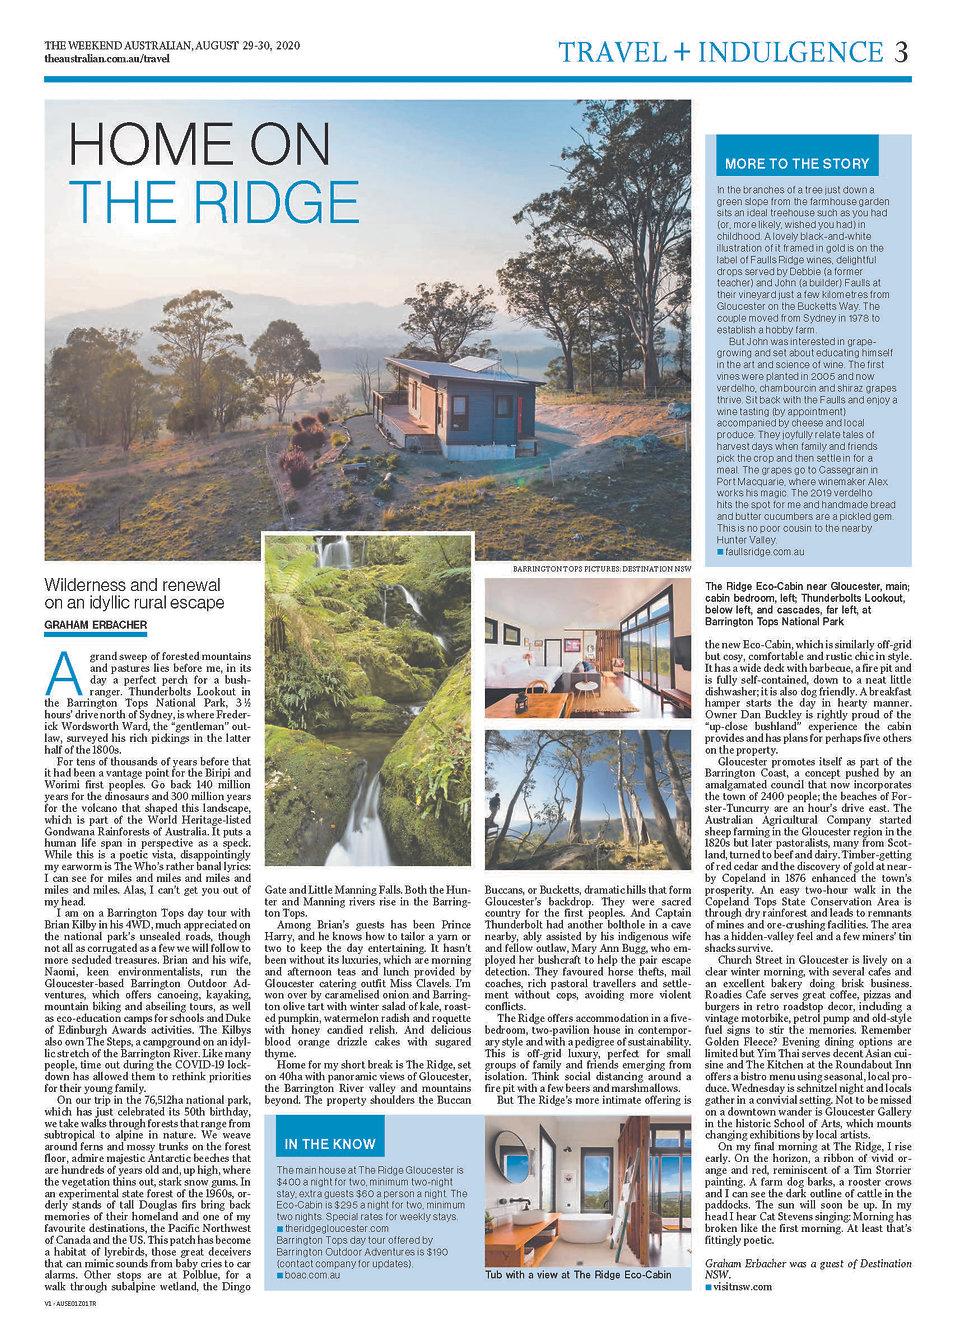 Travel & Indulgence Section Page 3 Weeke